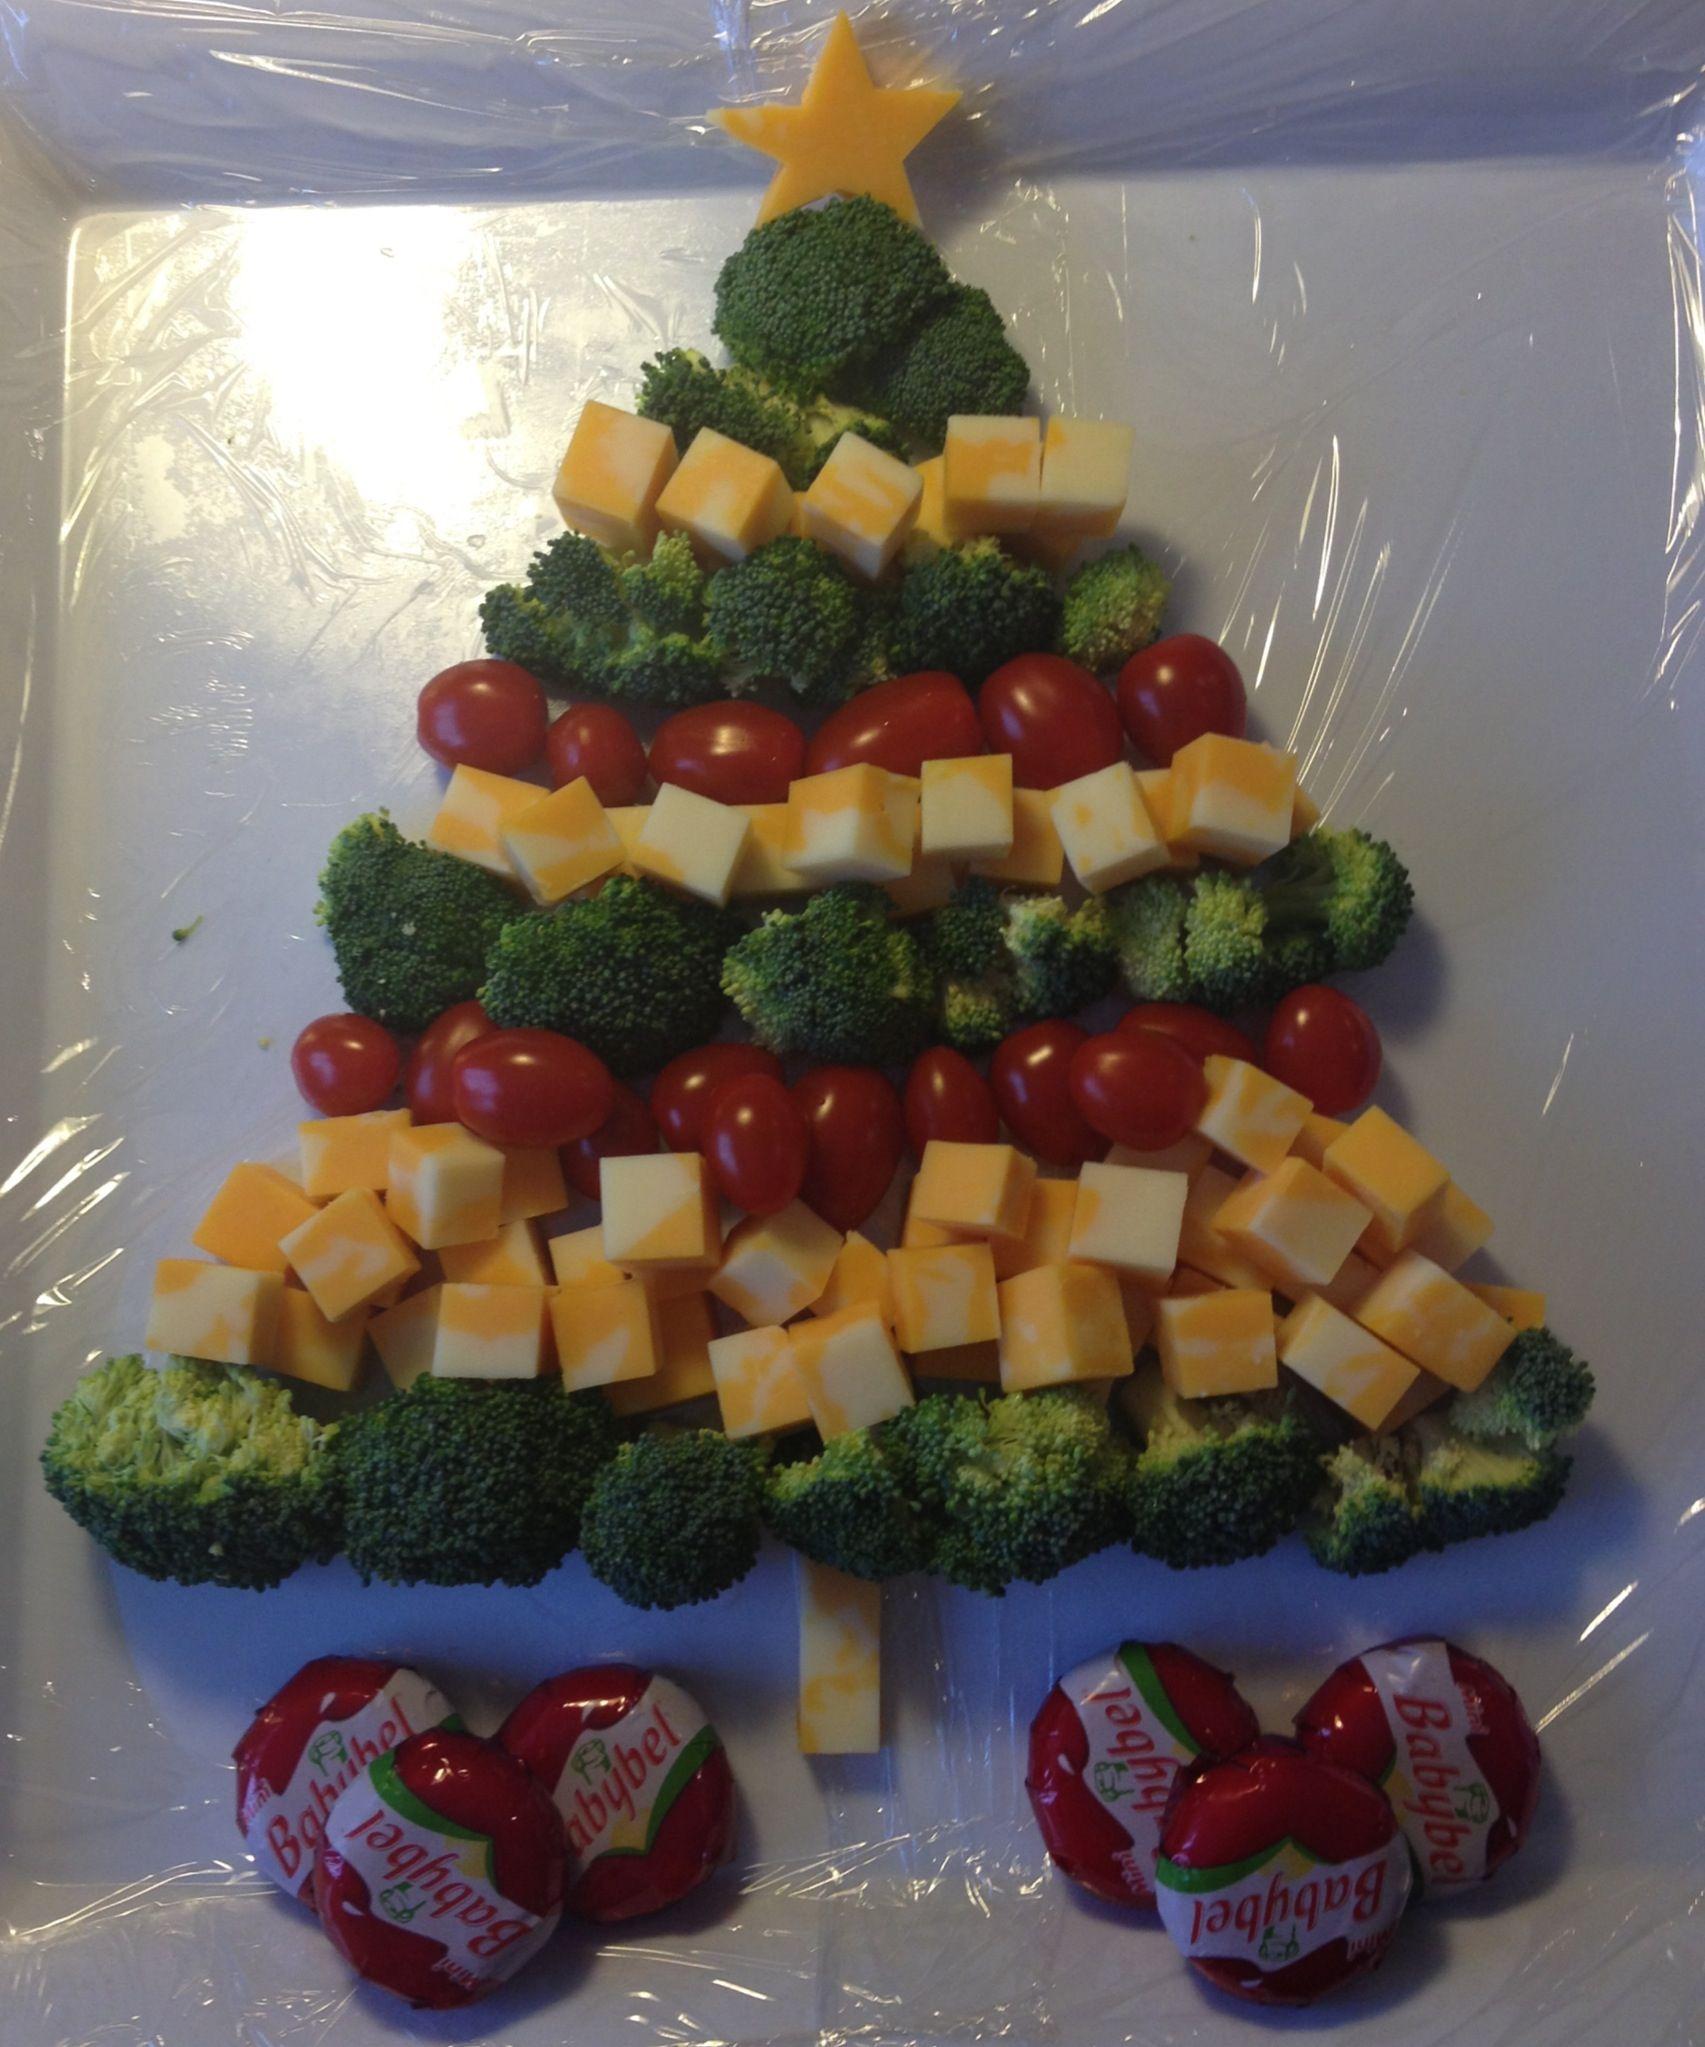 Veggie Christmas Tree Recipe: Christmas Tree Cheese Platter With Broccoli And Cherry